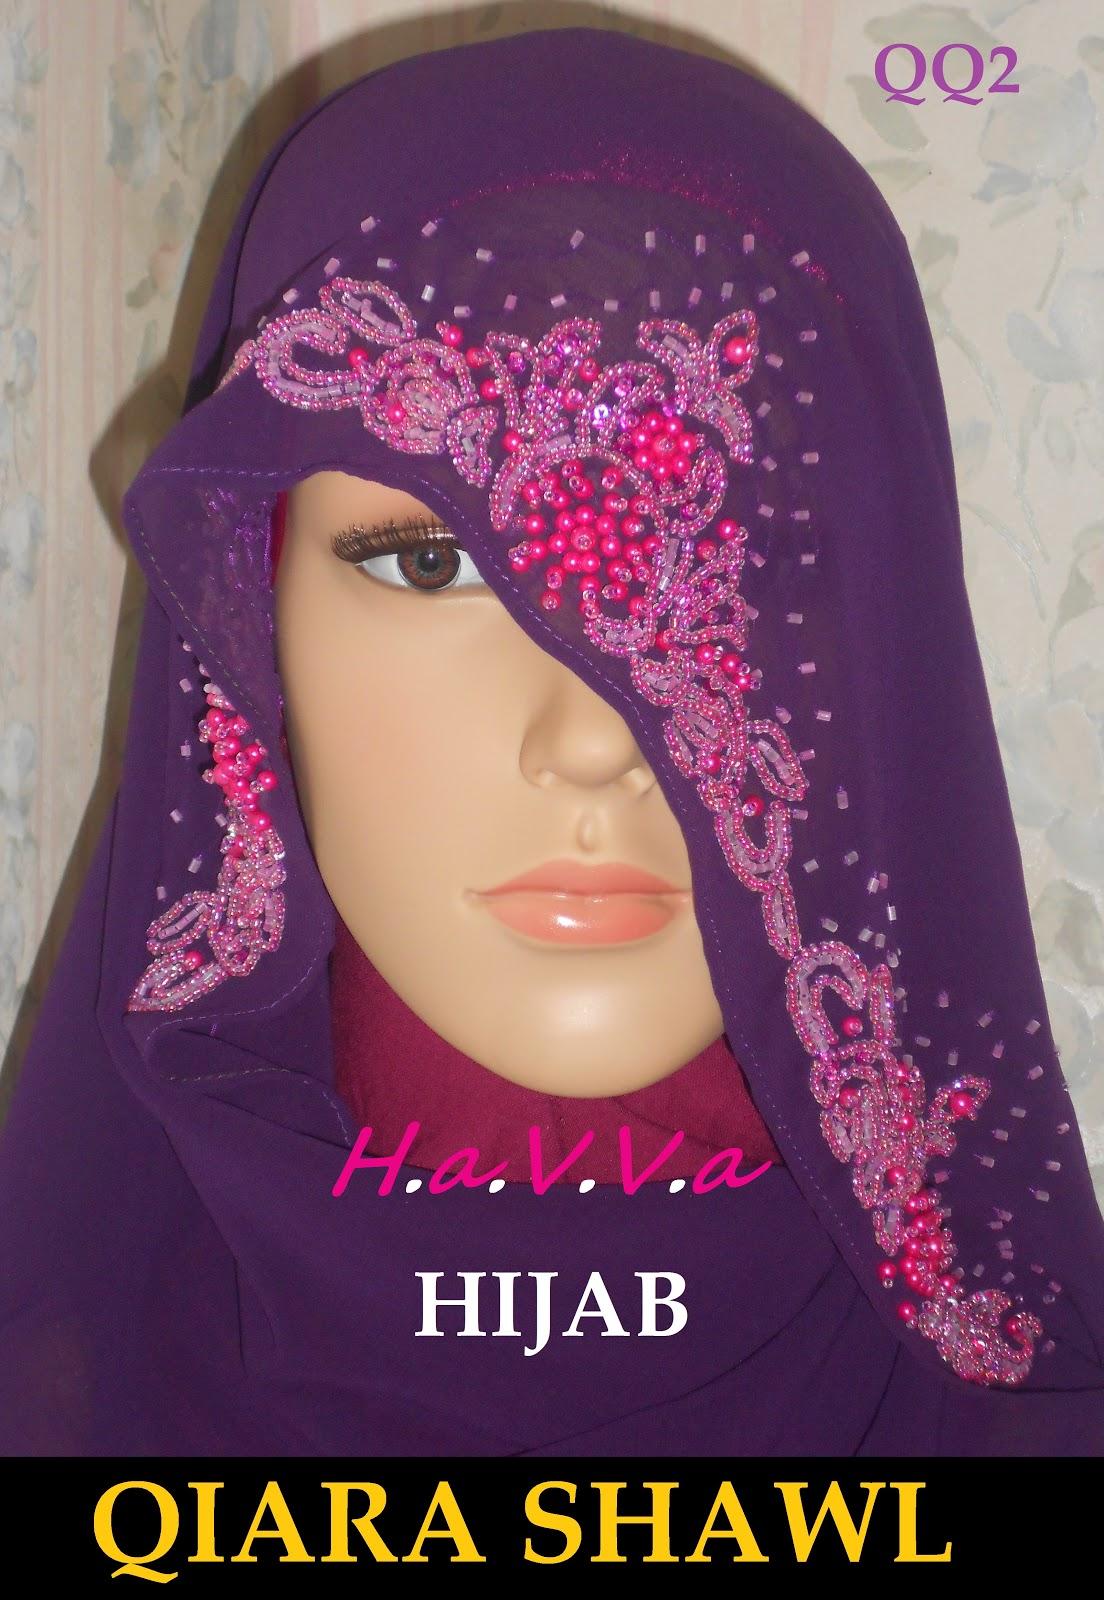 Qiara Shawl